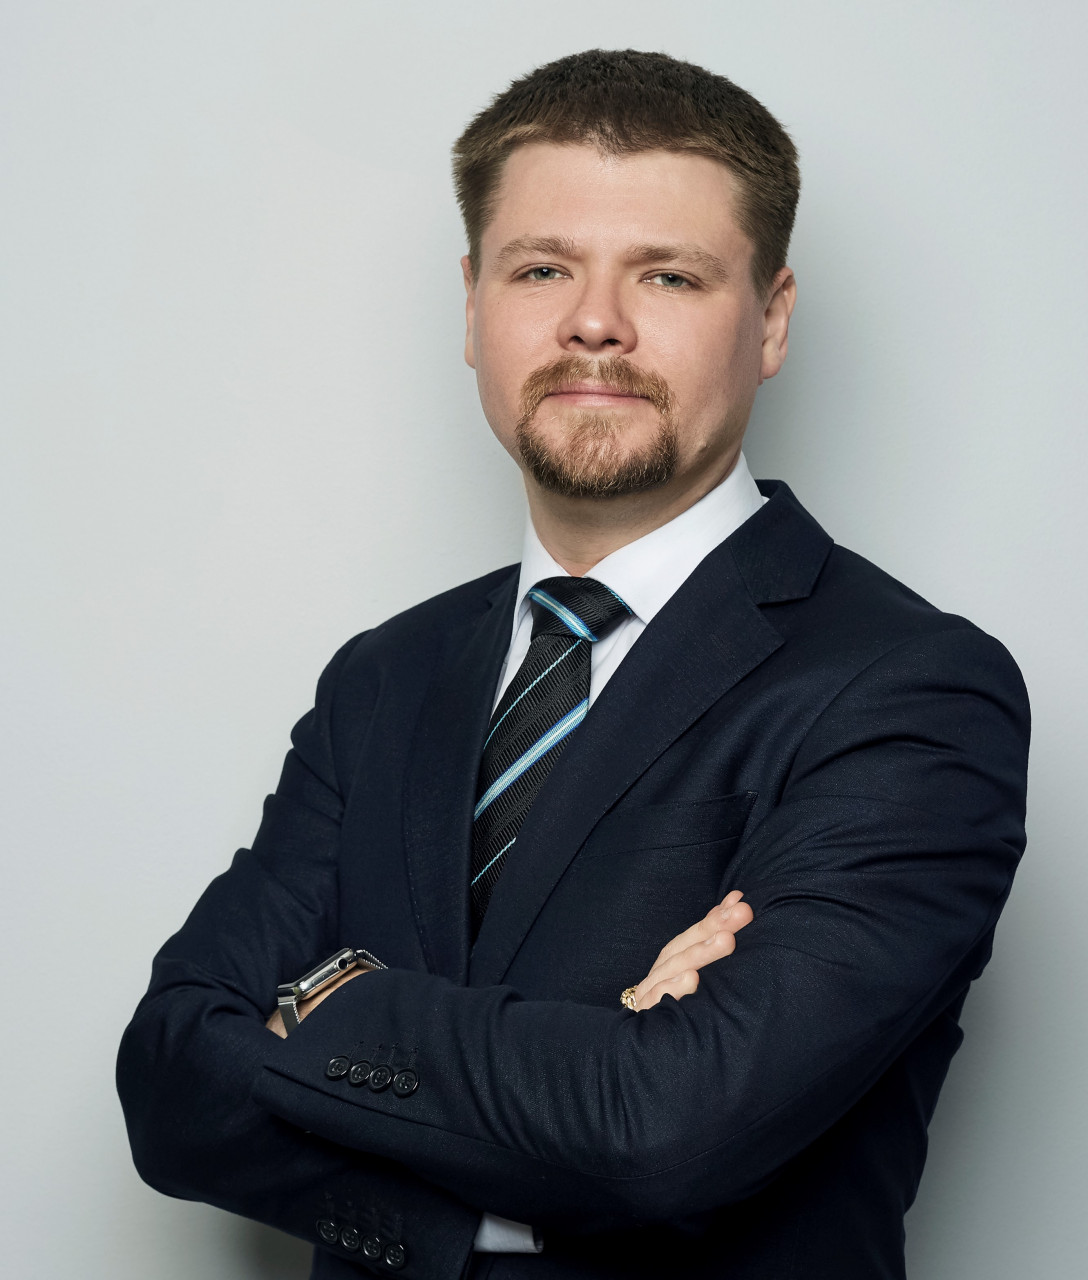 Бойцов Александр Владимирович